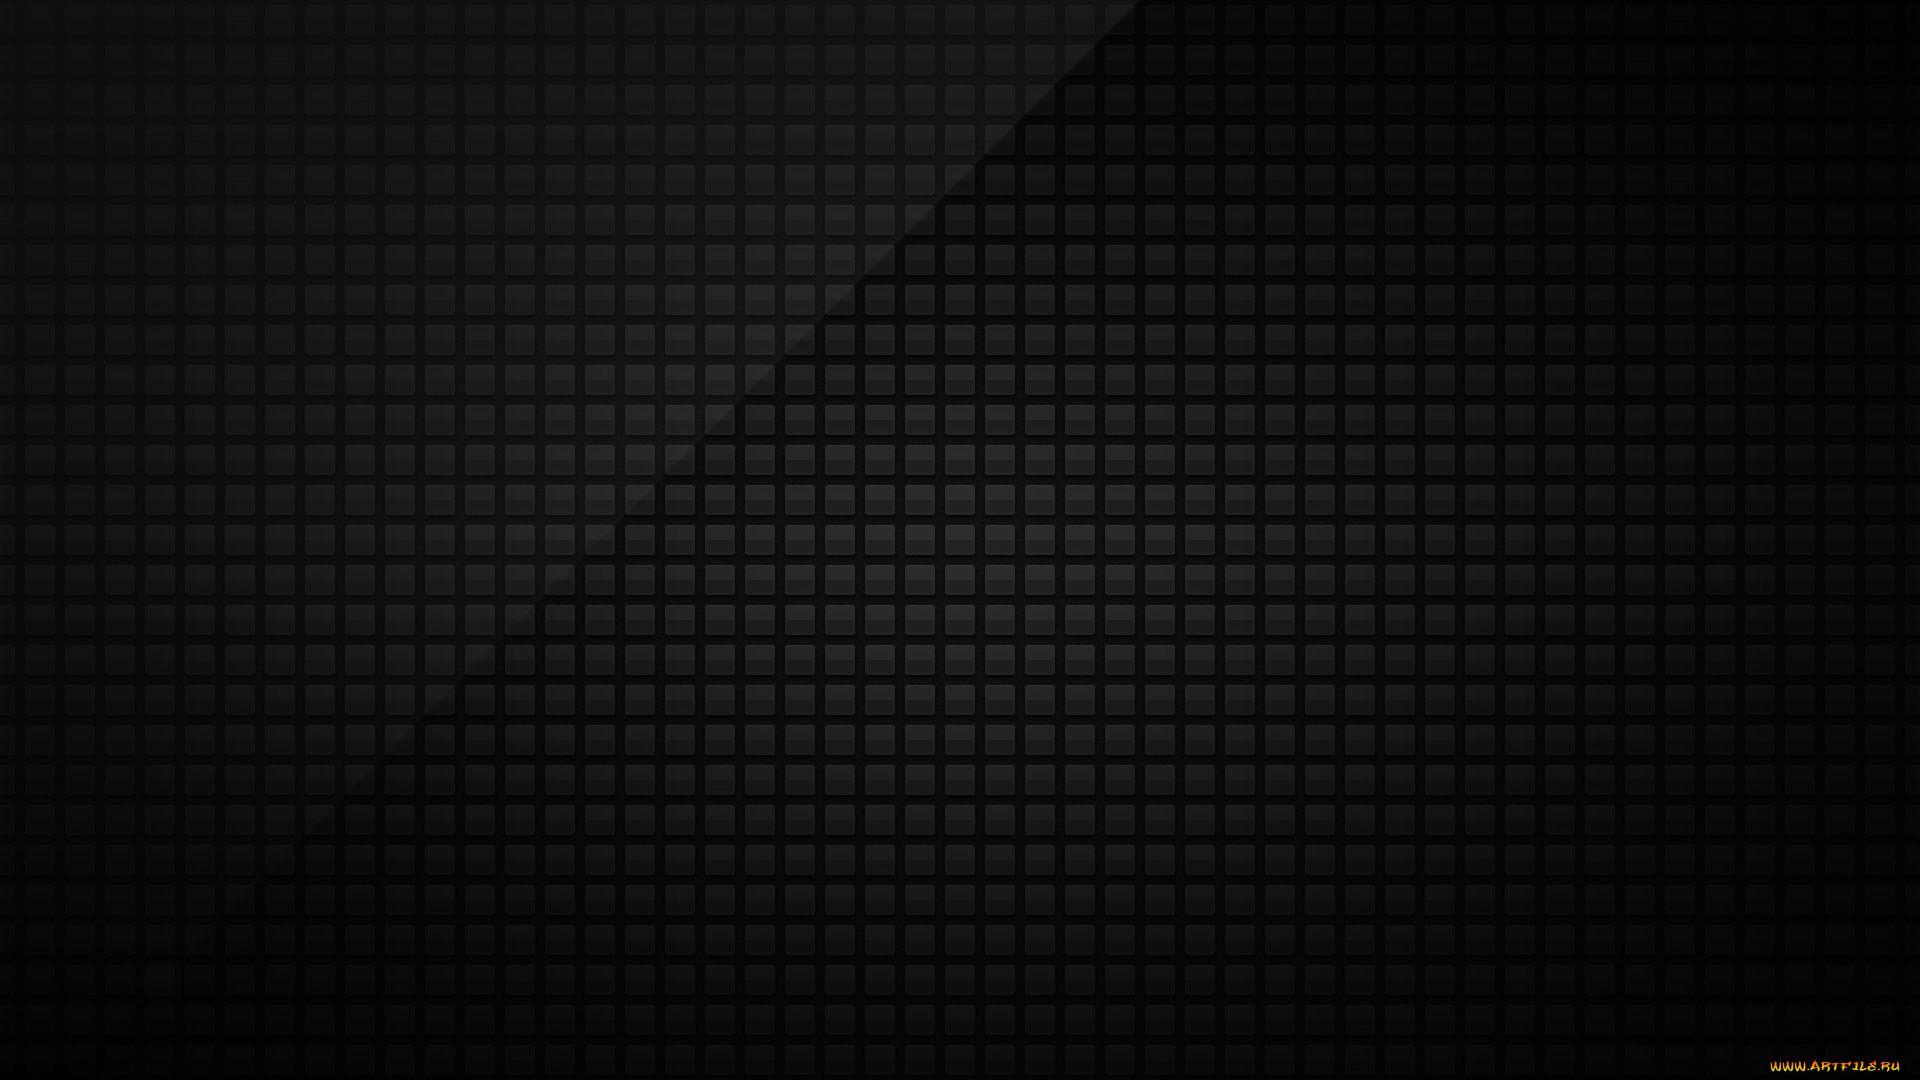 Free Website Background hd desktop